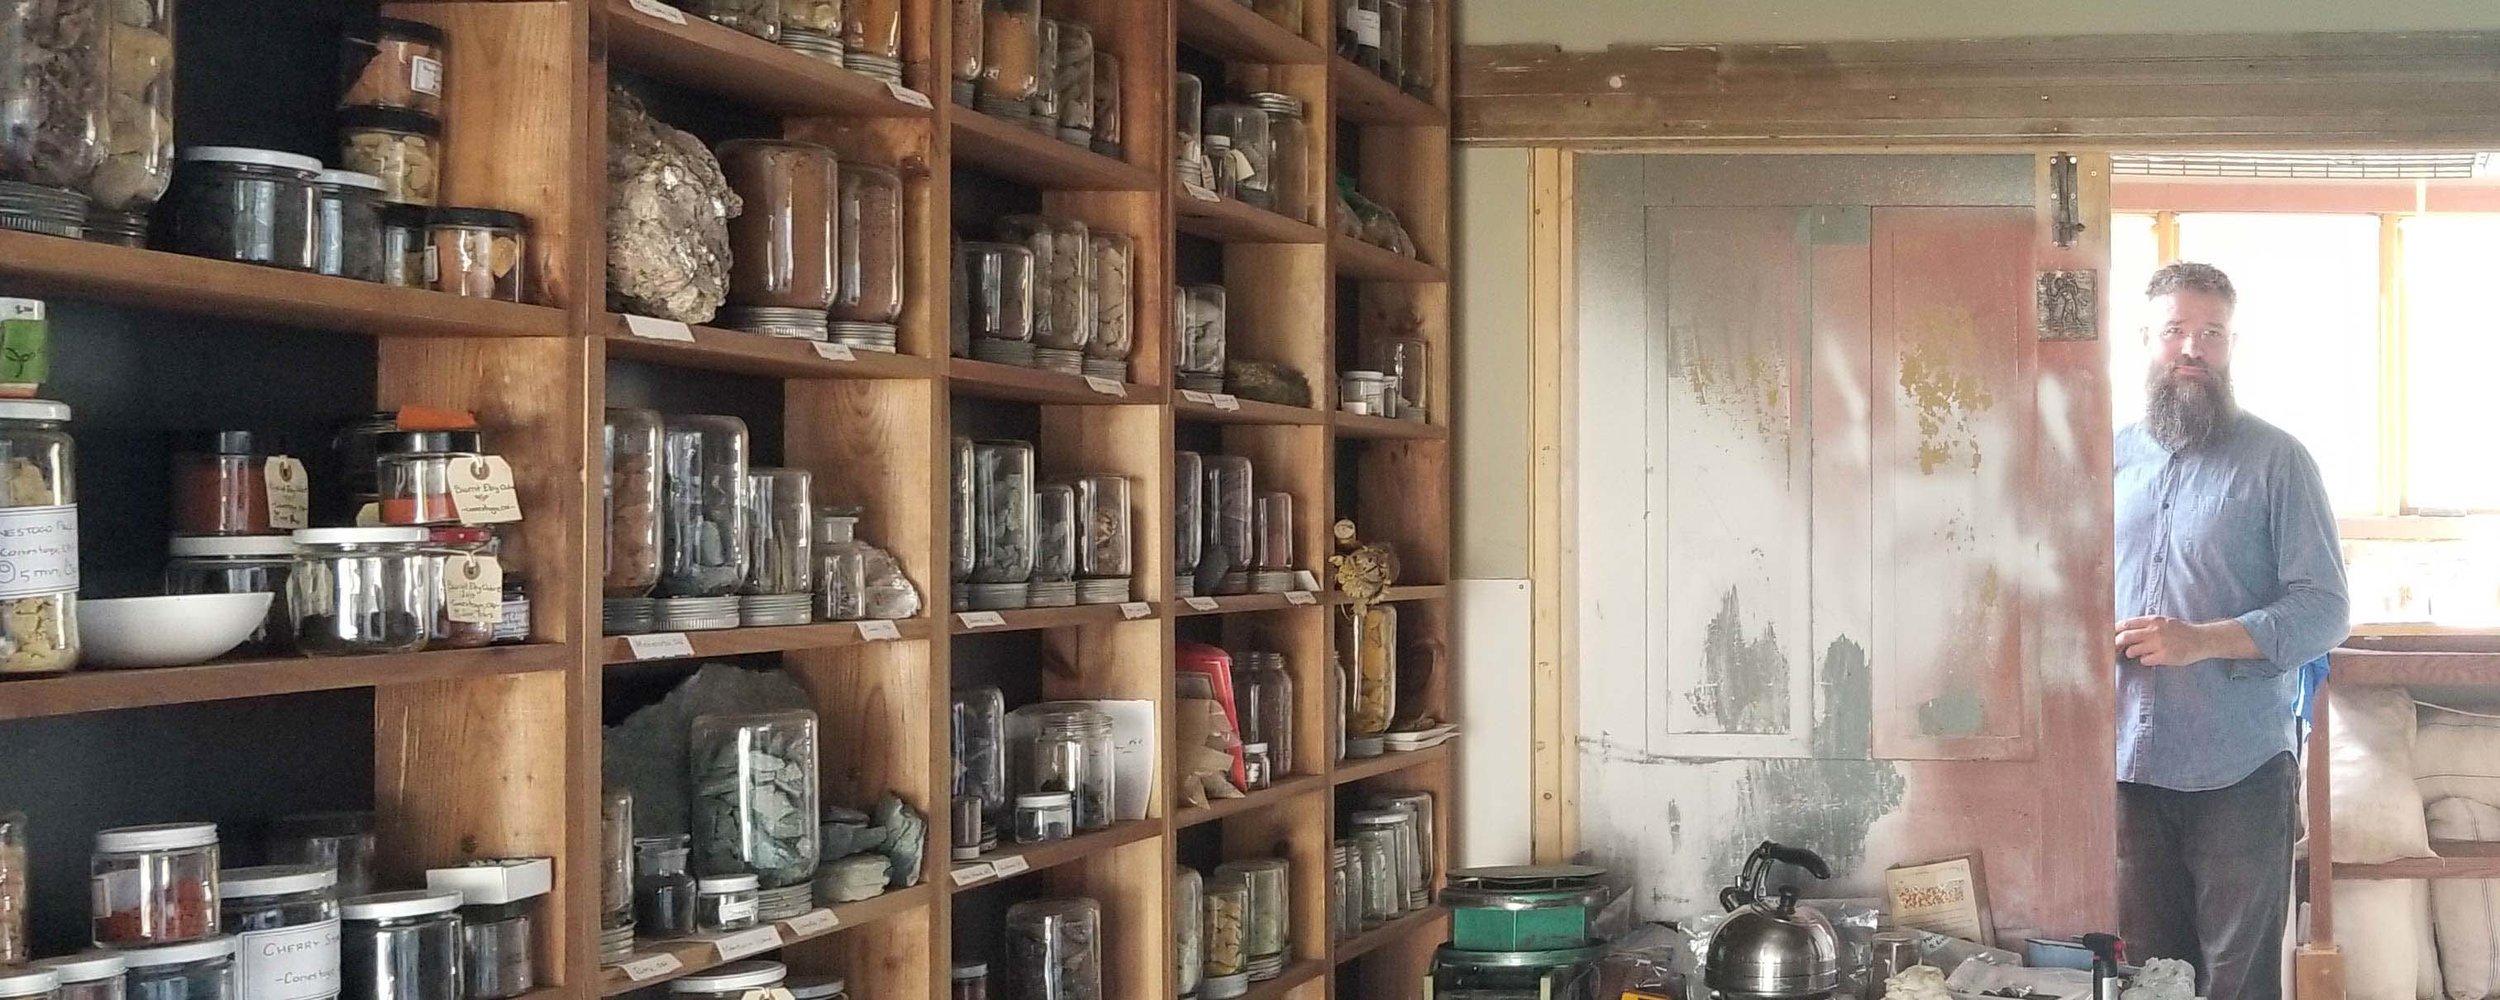 Symeon Van Donkelaar with his wunderkammer collection. Photo courtesy of Symeon Van Donkelaar .